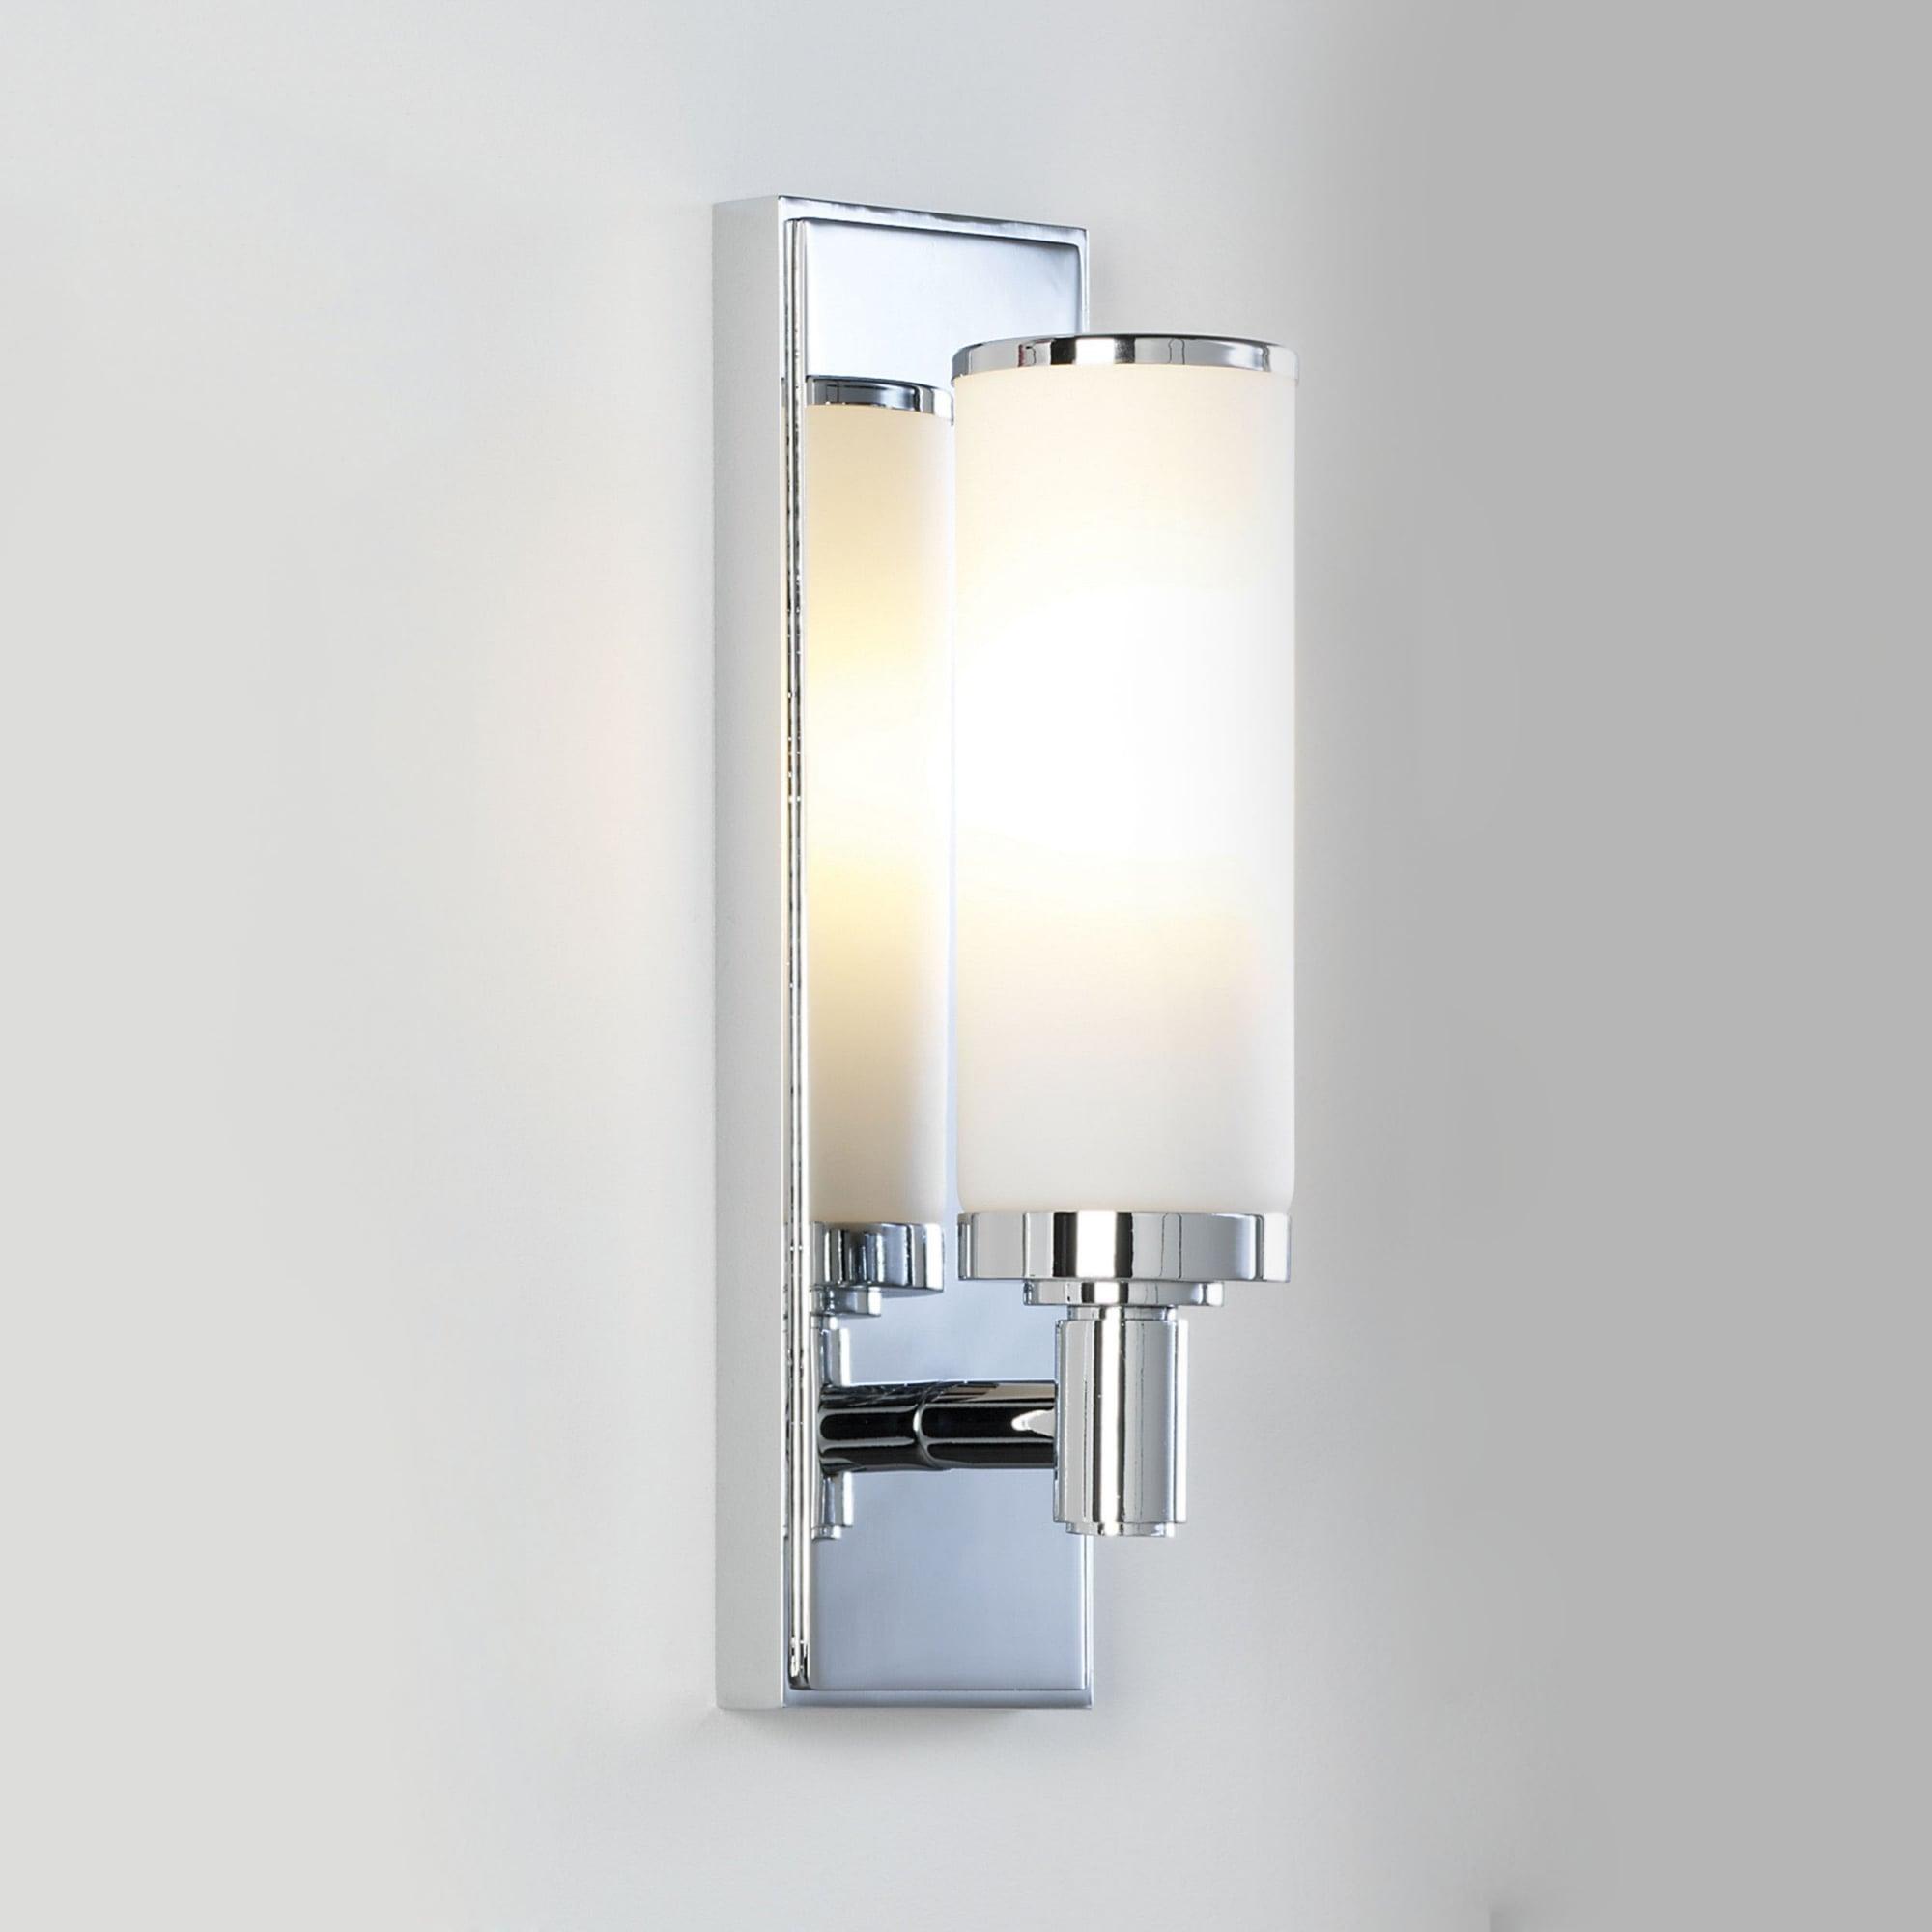 Astro 1147001 Verona Chrome Wall Light Ip44 With Opal Tube Ideas4lighting Sku34521i4l